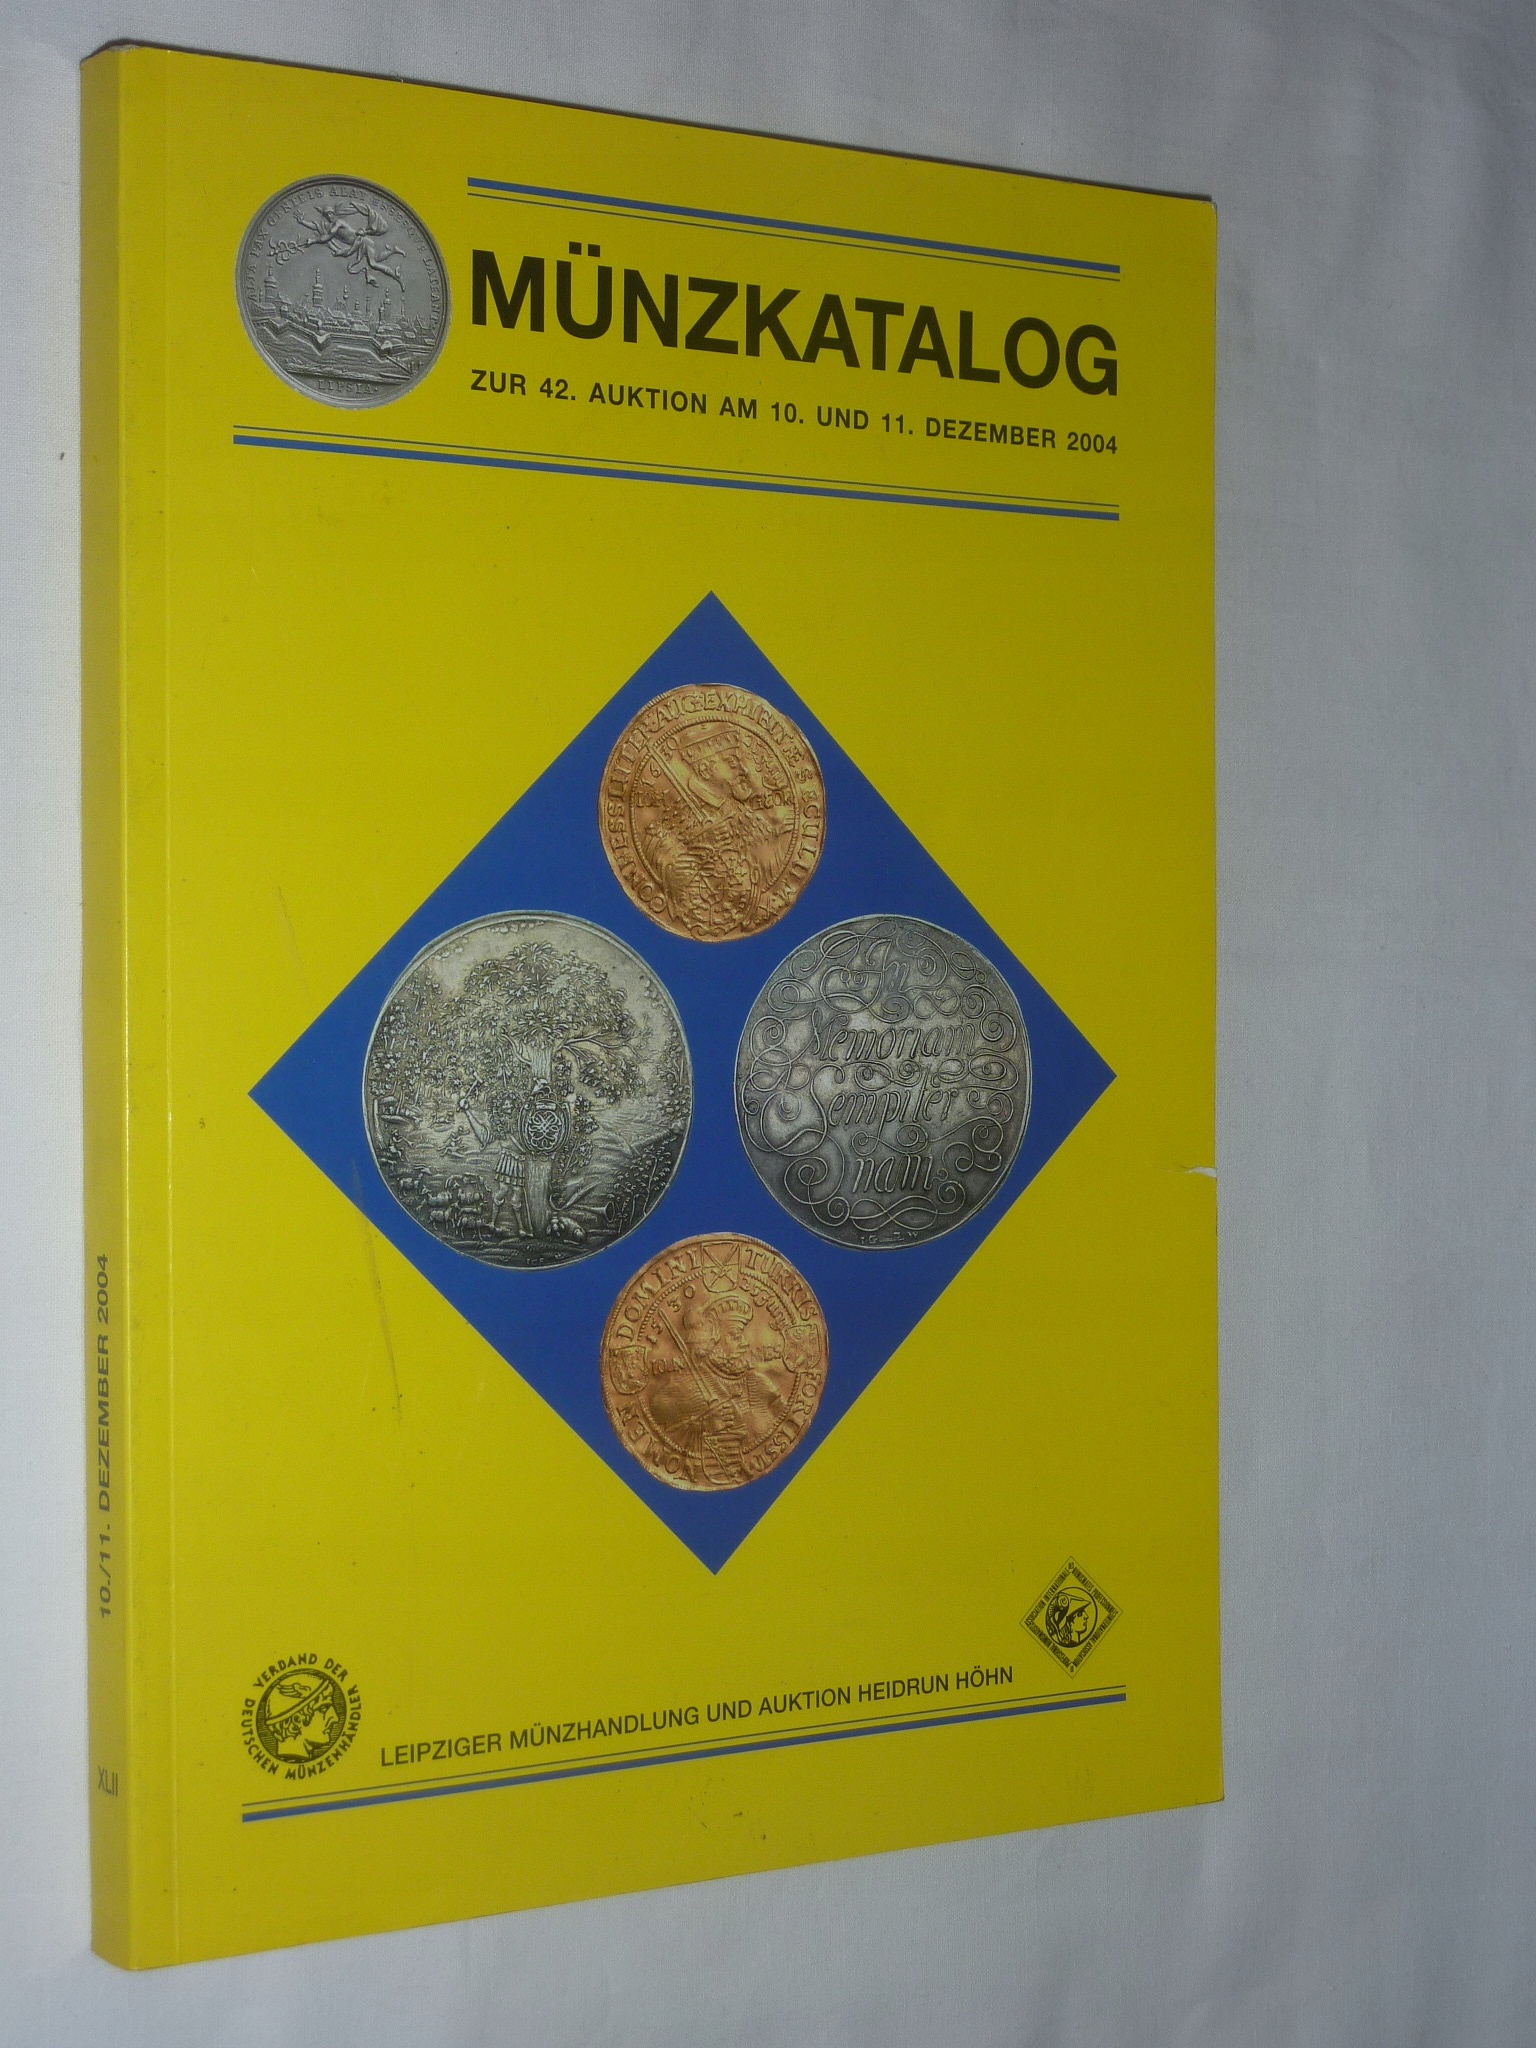 KATALOG AUKCYJNY,MUNZKATALOG AUKCJA 10 i 11,2004 r